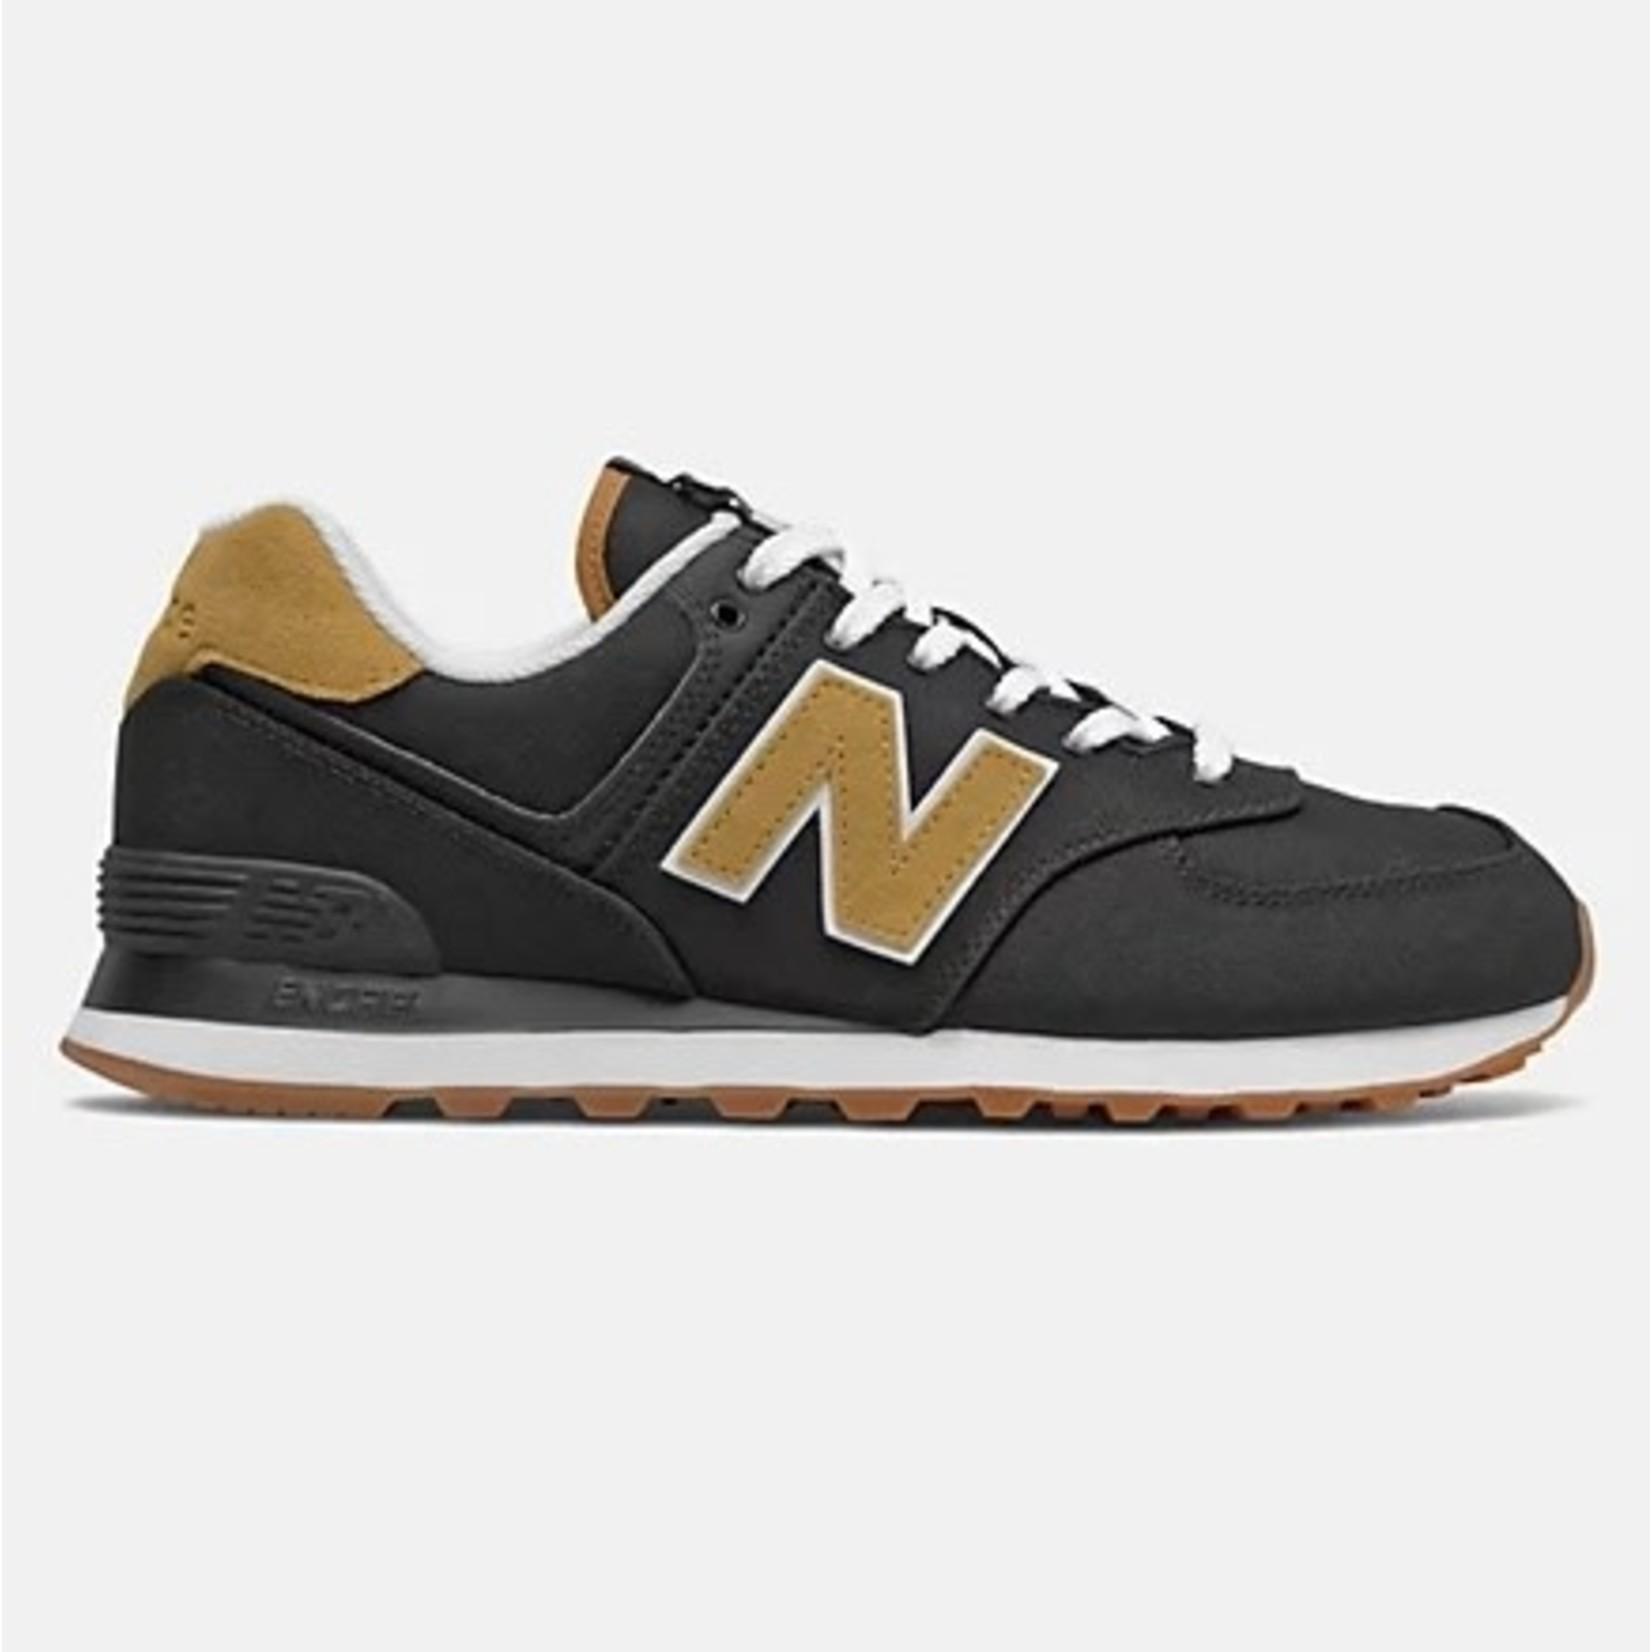 New Balance New Balance Casual Shoes, 574, Mens